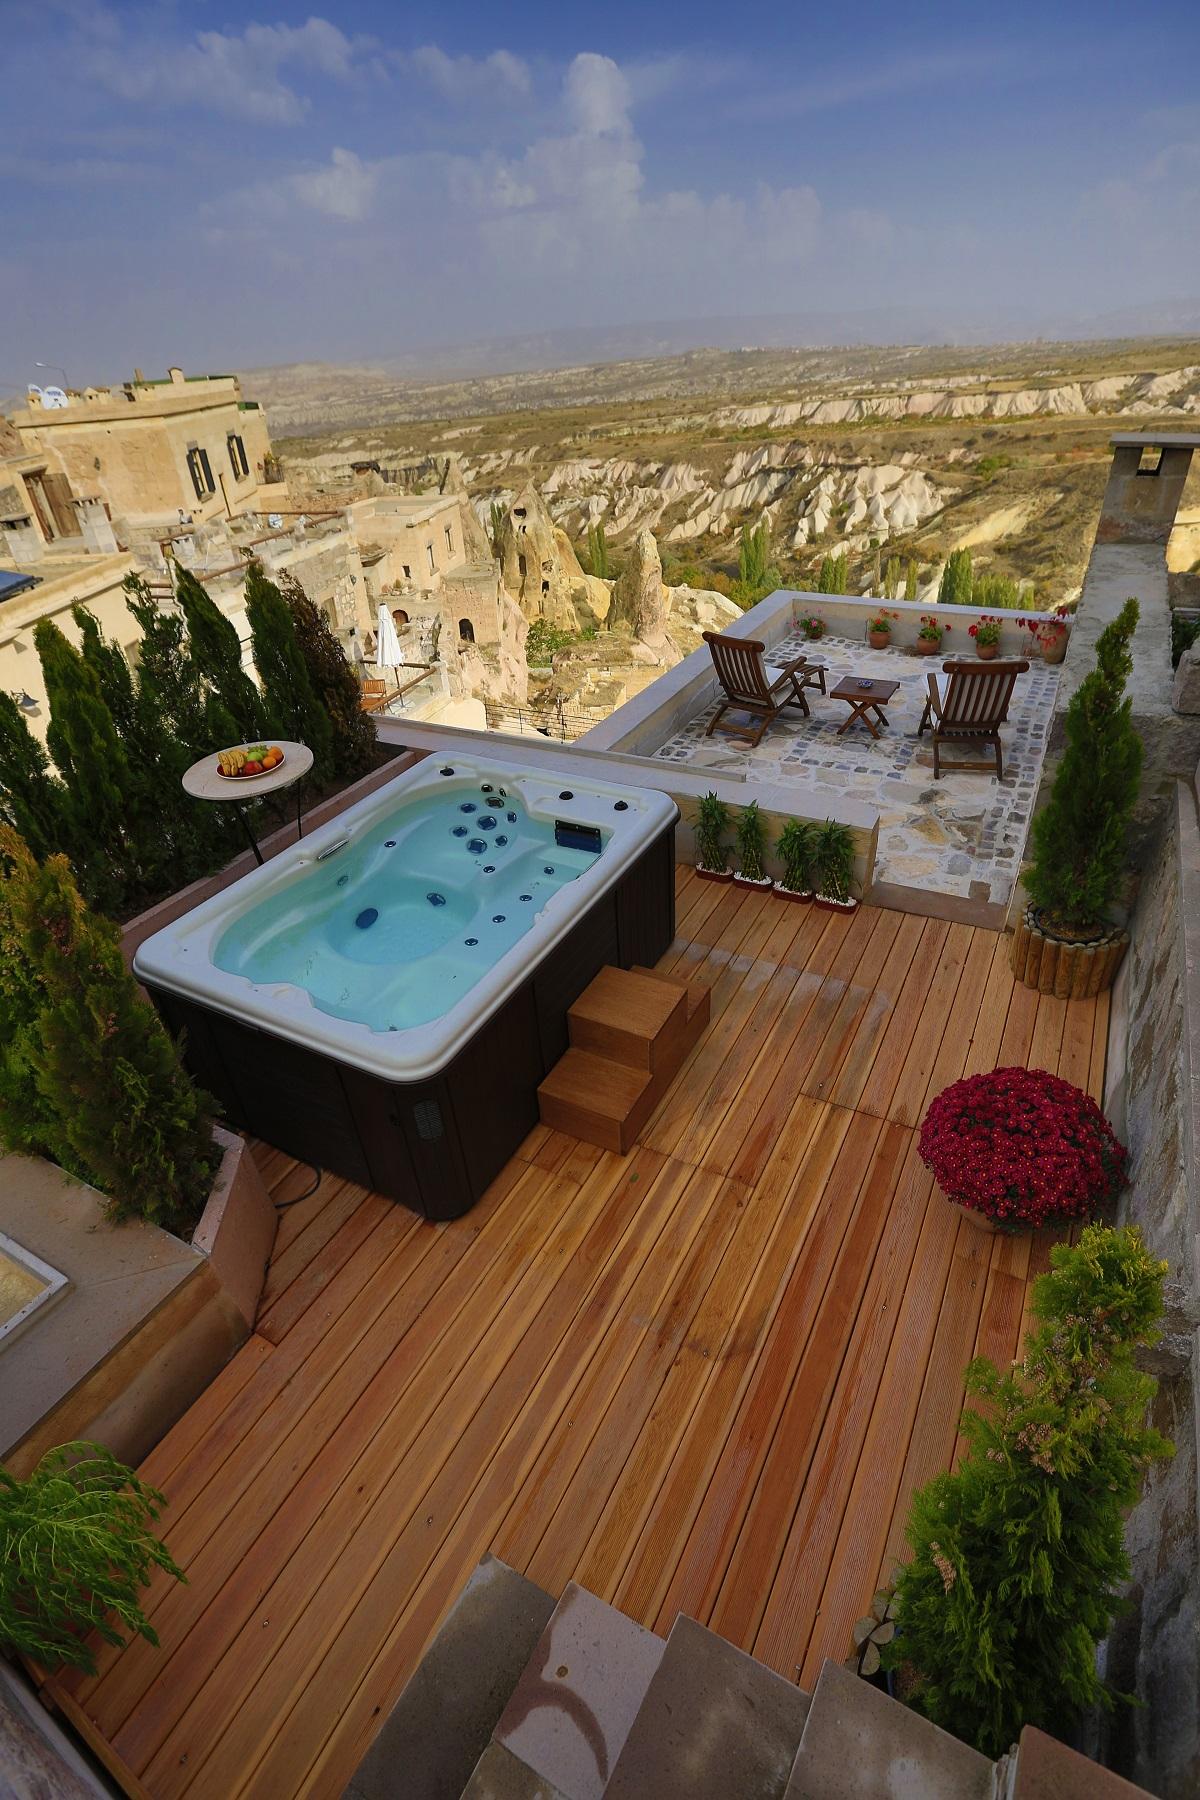 Taskonaklar Rocky Palace - Cappadocia, Turkey 1